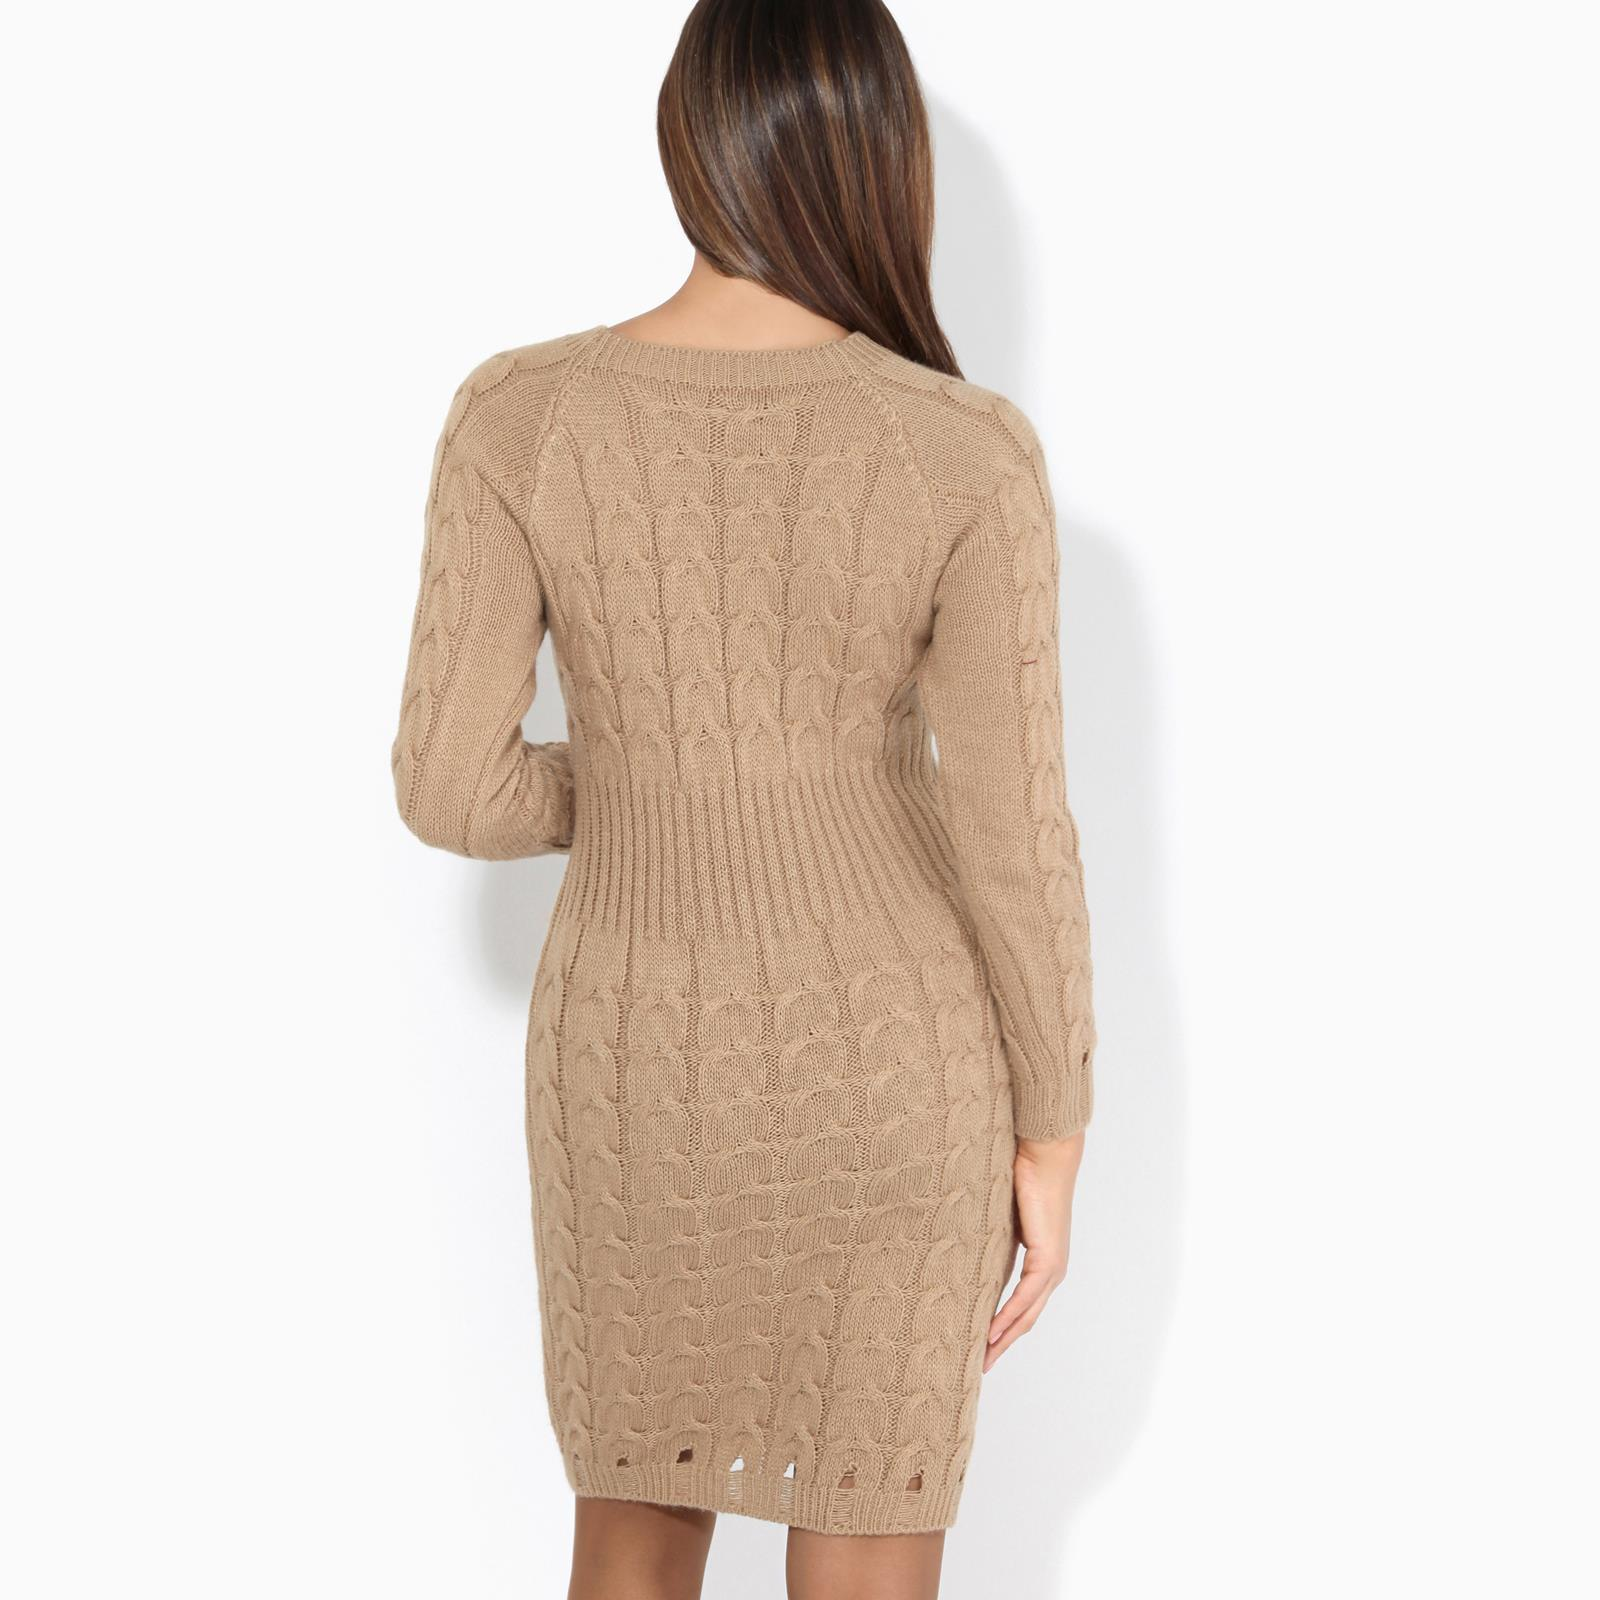 Womens-Ladies-Jumper-Dress-Longsleeve-Mini-Warm-Winter-Knit-Top-Bodycon thumbnail 10